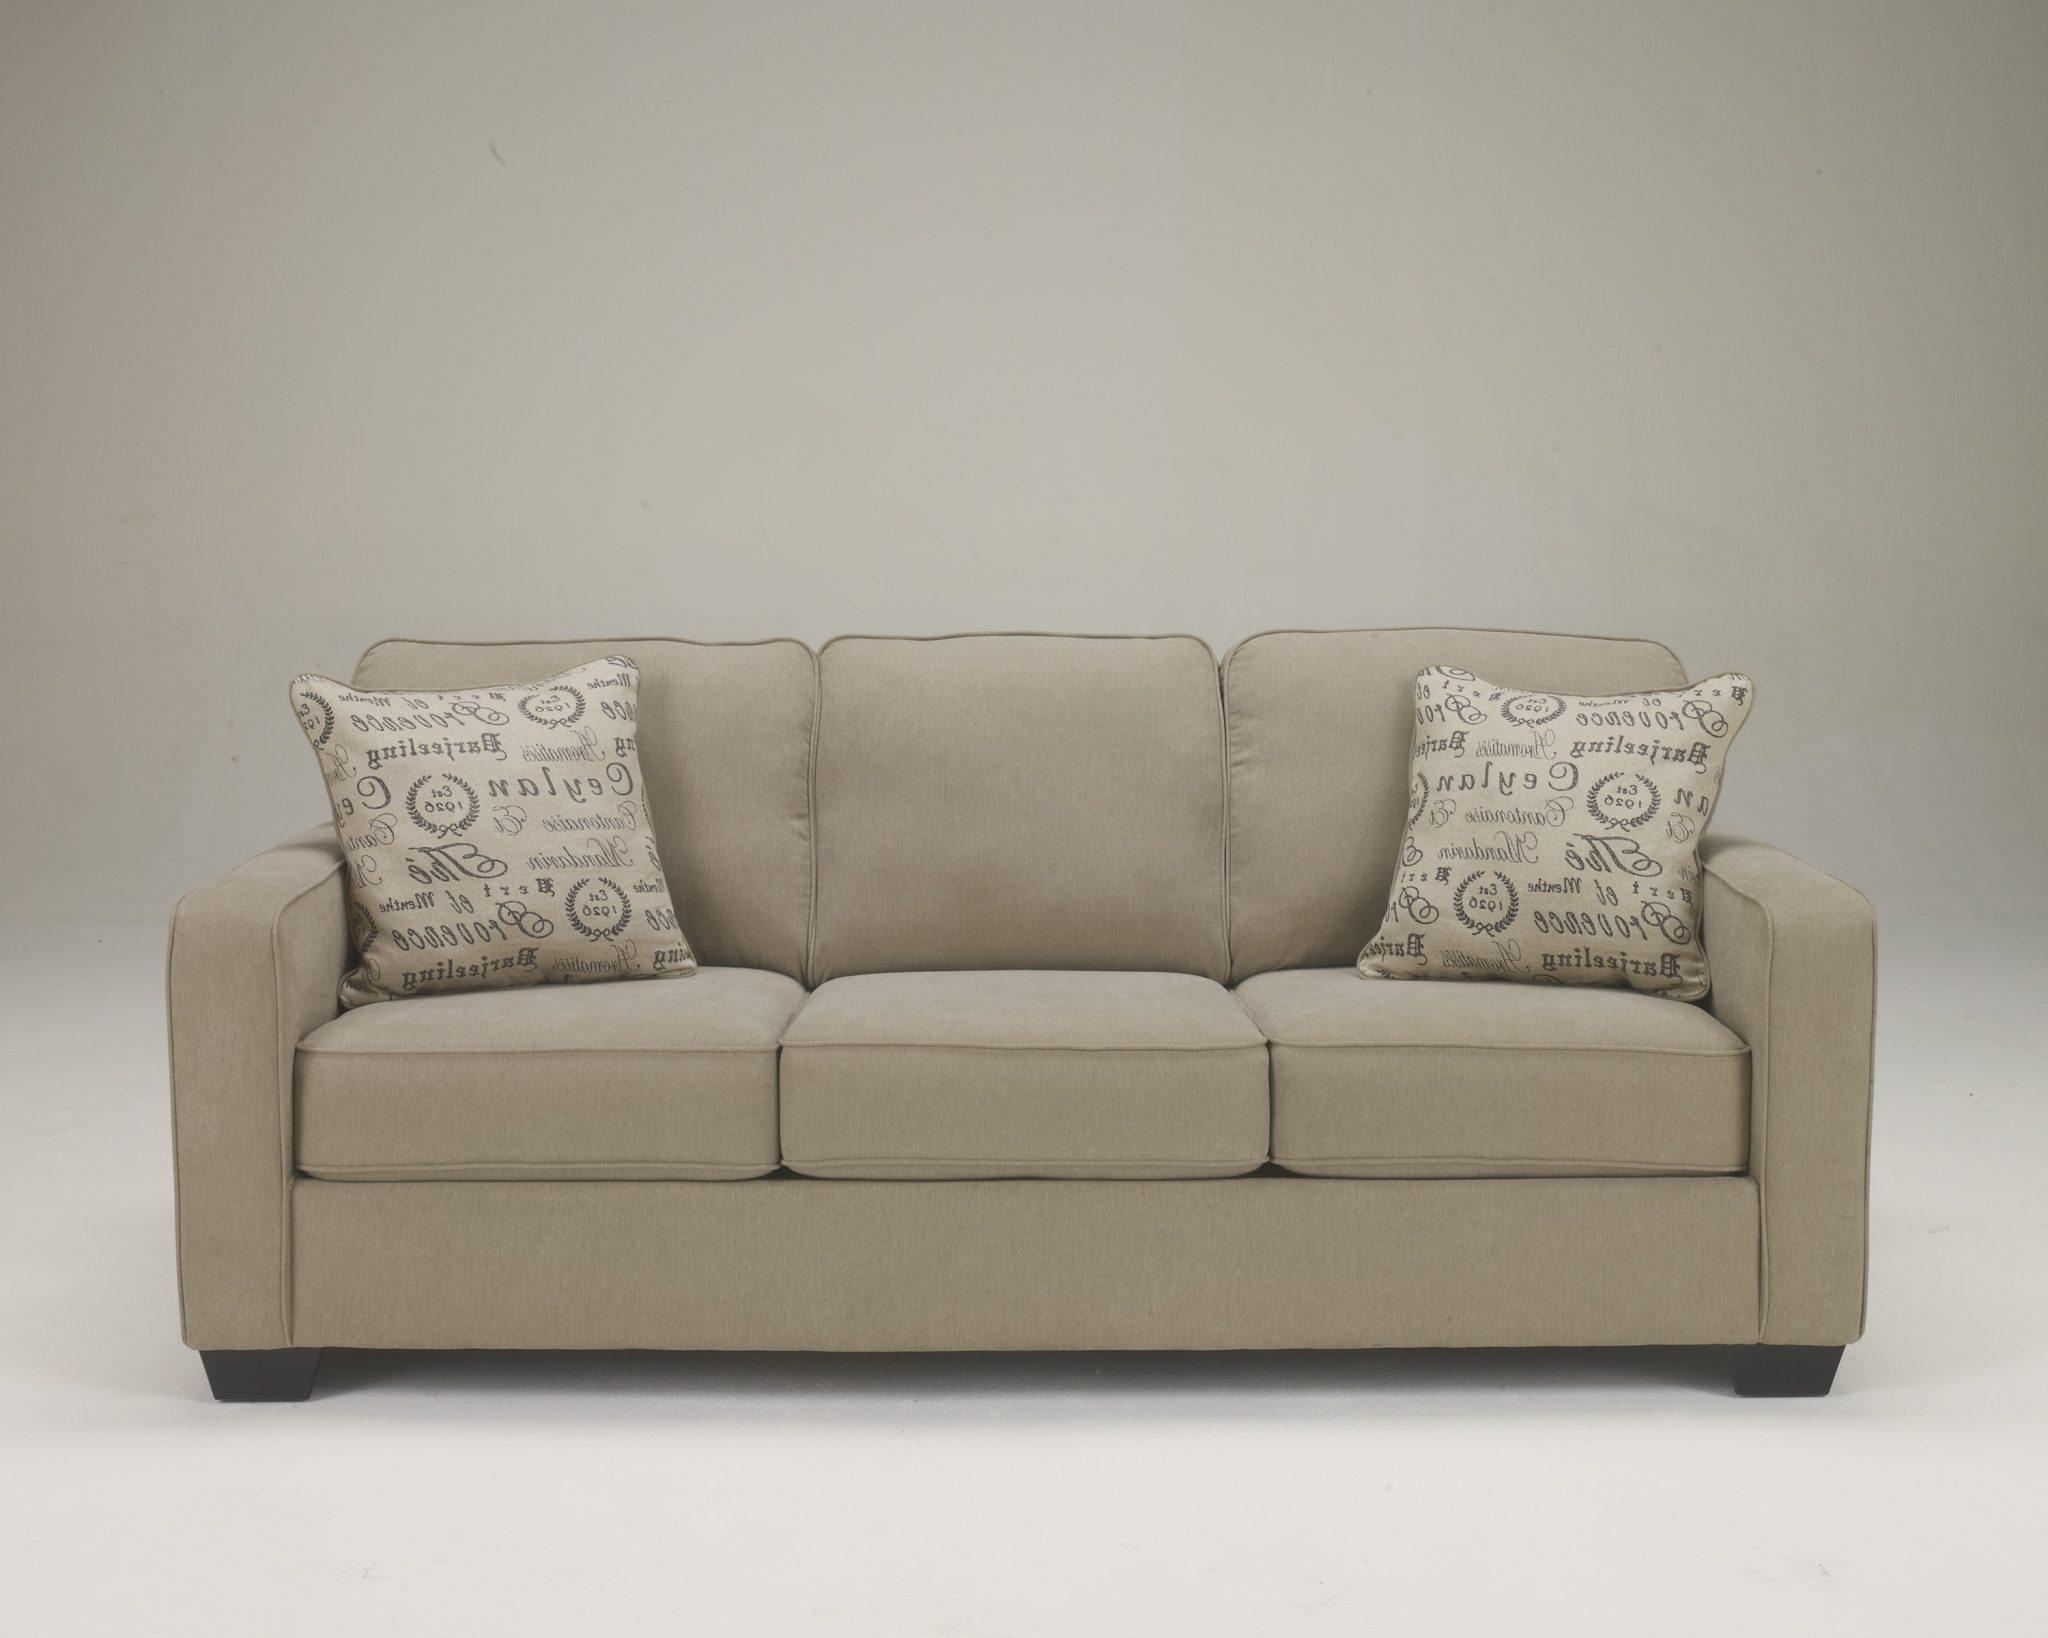 Sofas Center : Unusual Sears Reclining Sofa Images Design Recliner Regarding Sears Sofa (Image 19 of 20)